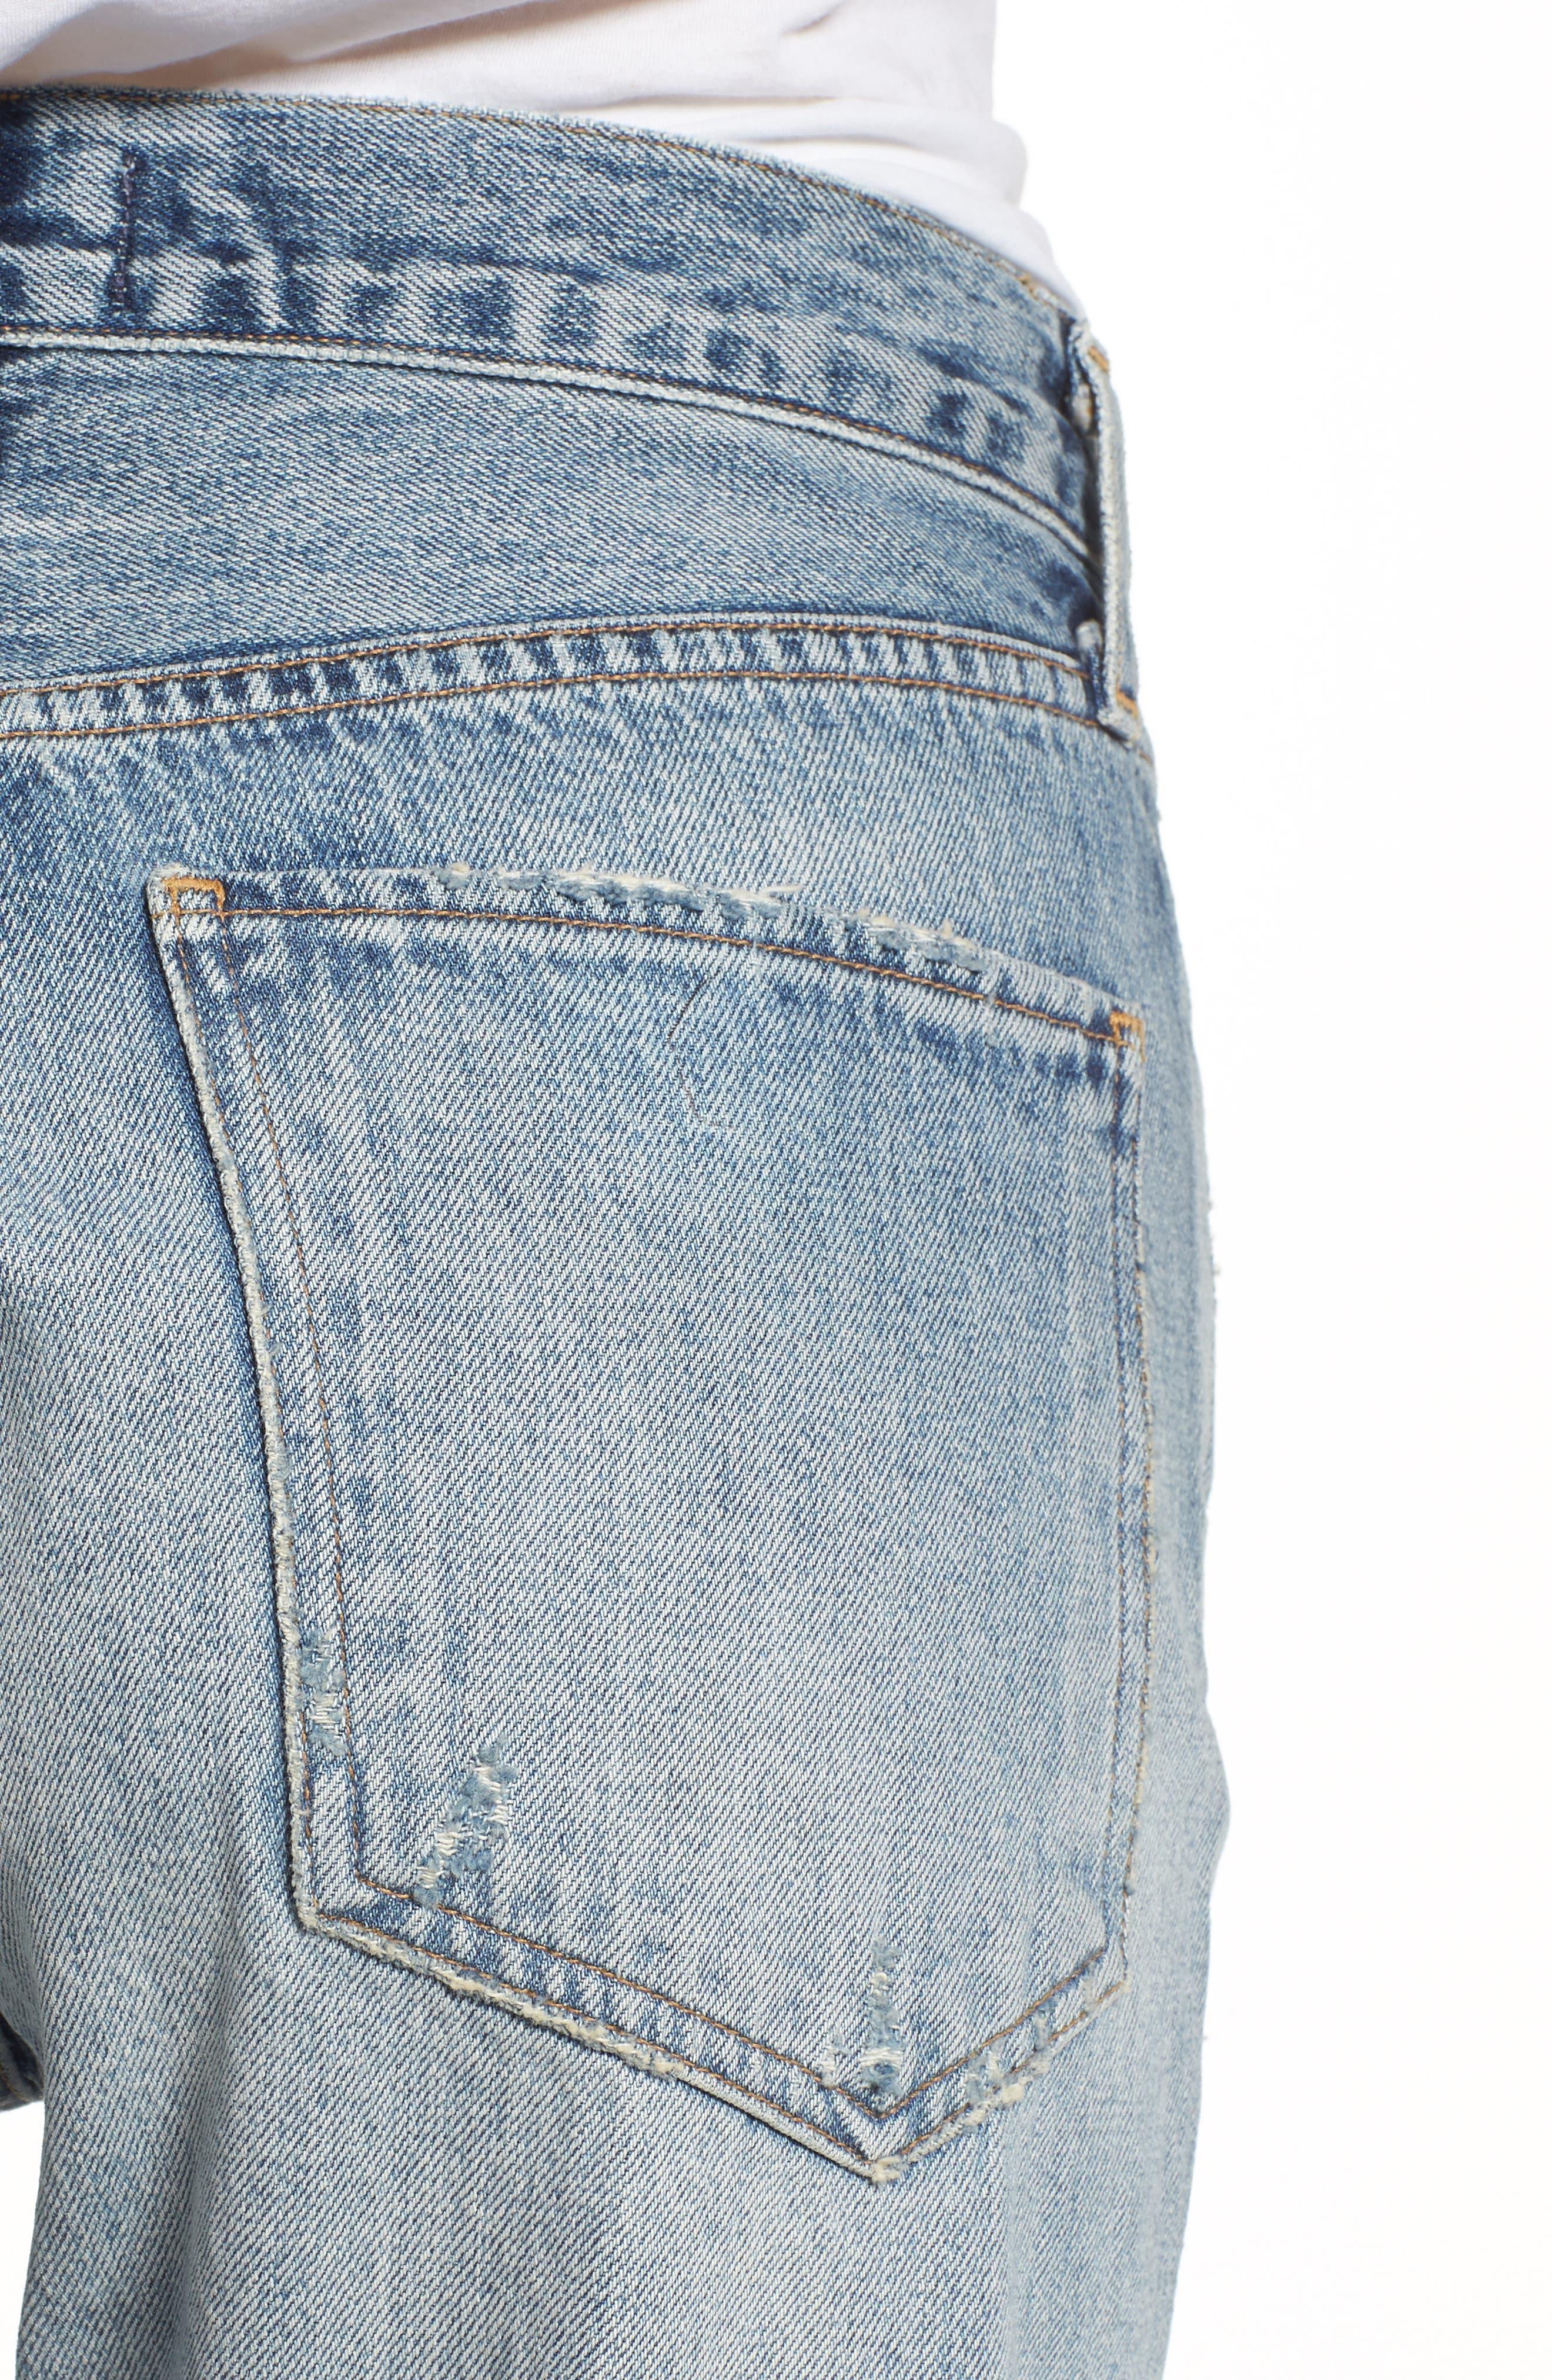 Jamie High Waist Ankle Jeans,                             Alternate thumbnail 4, color,                             RESOLUTION